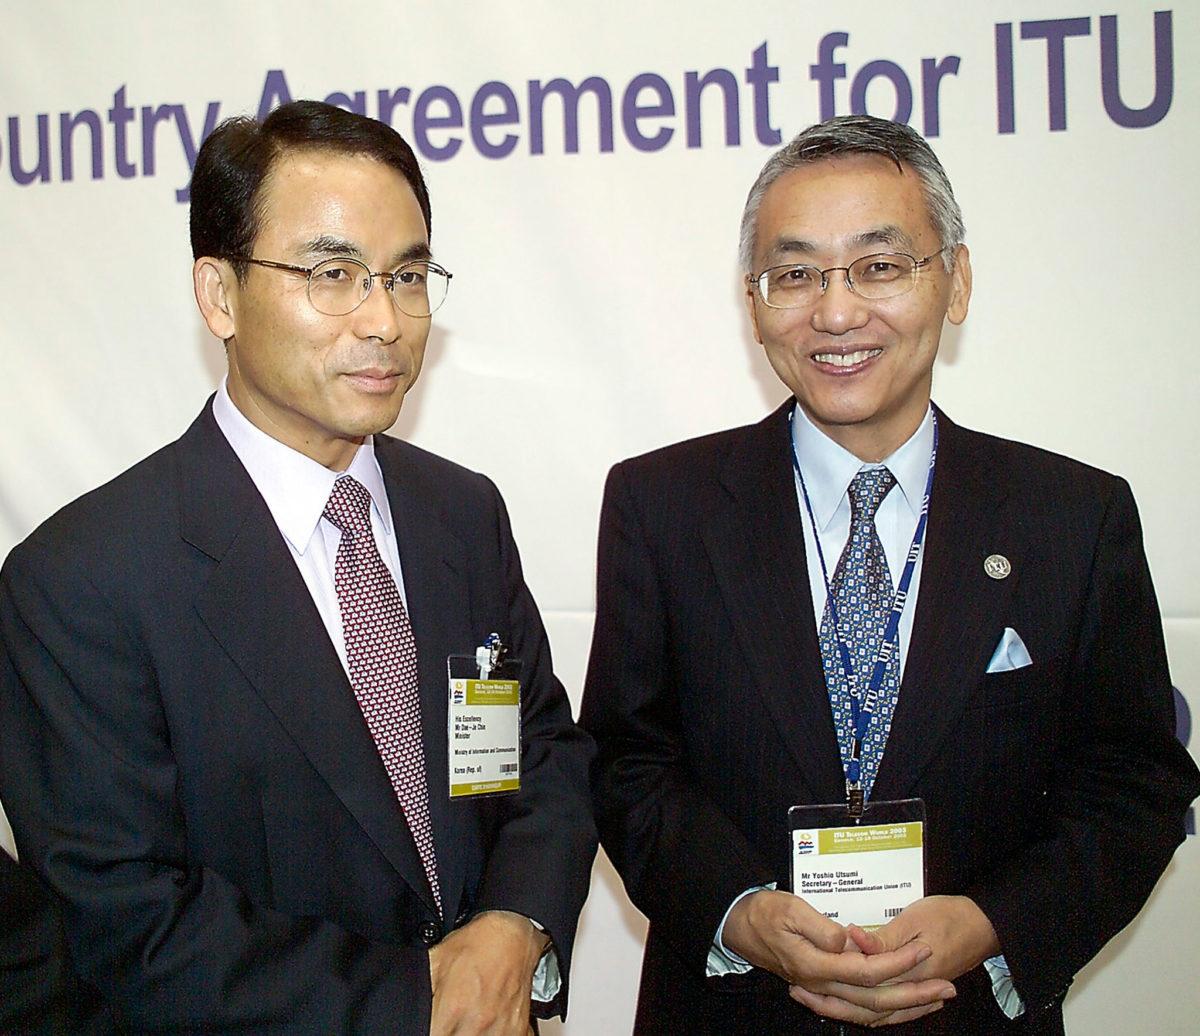 (right) Yoshio Utsumi, Secretary-General of ITU (1999-2006)